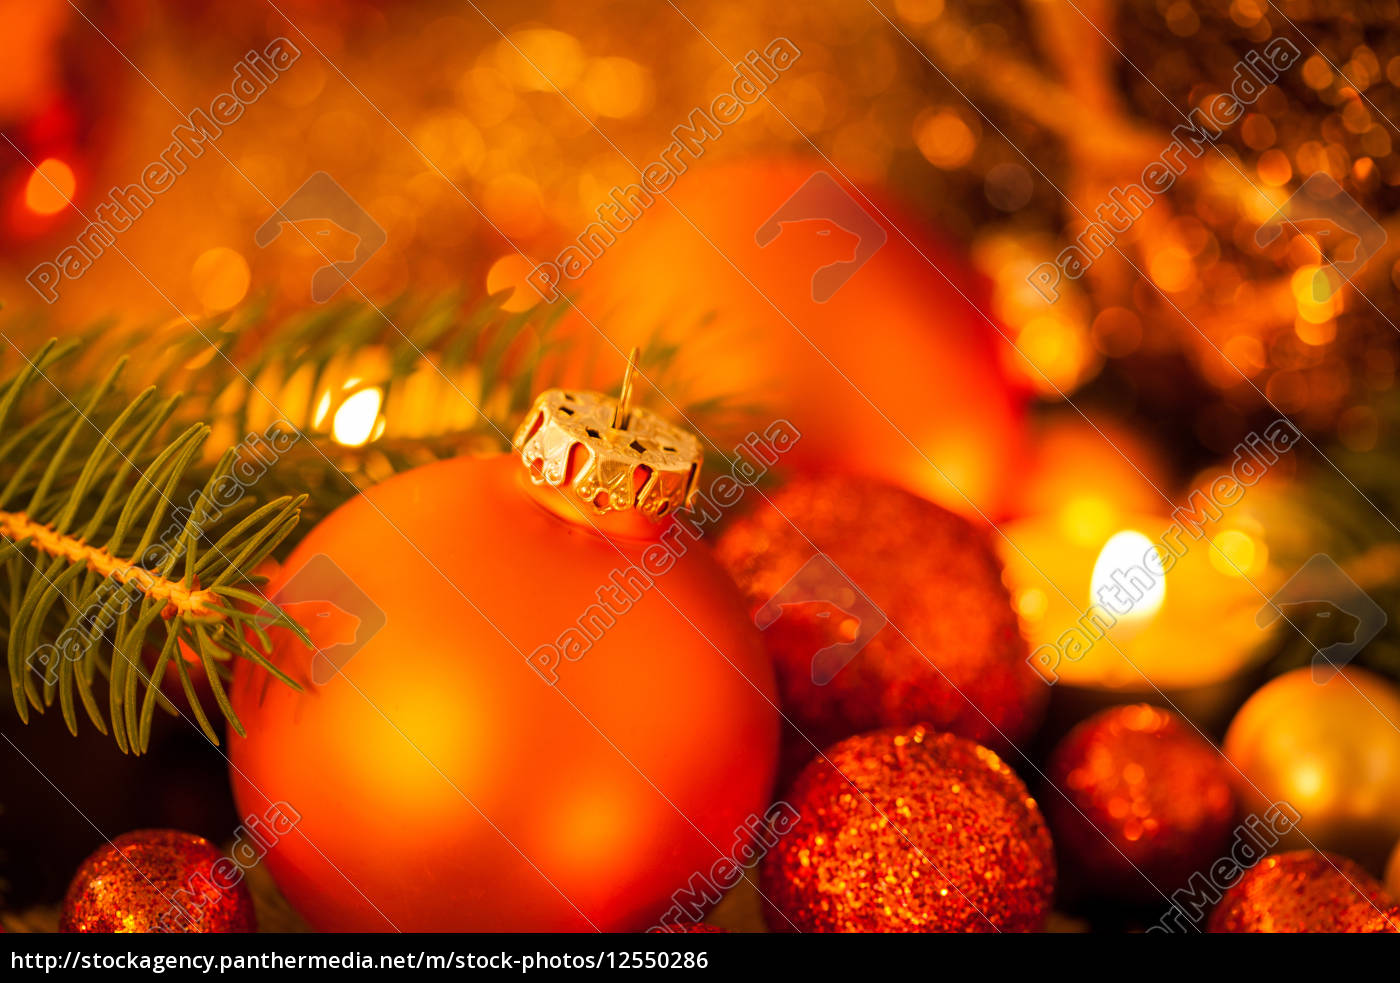 decorazioni, natalizie, calde, dorate, e, arancioni - 12550286